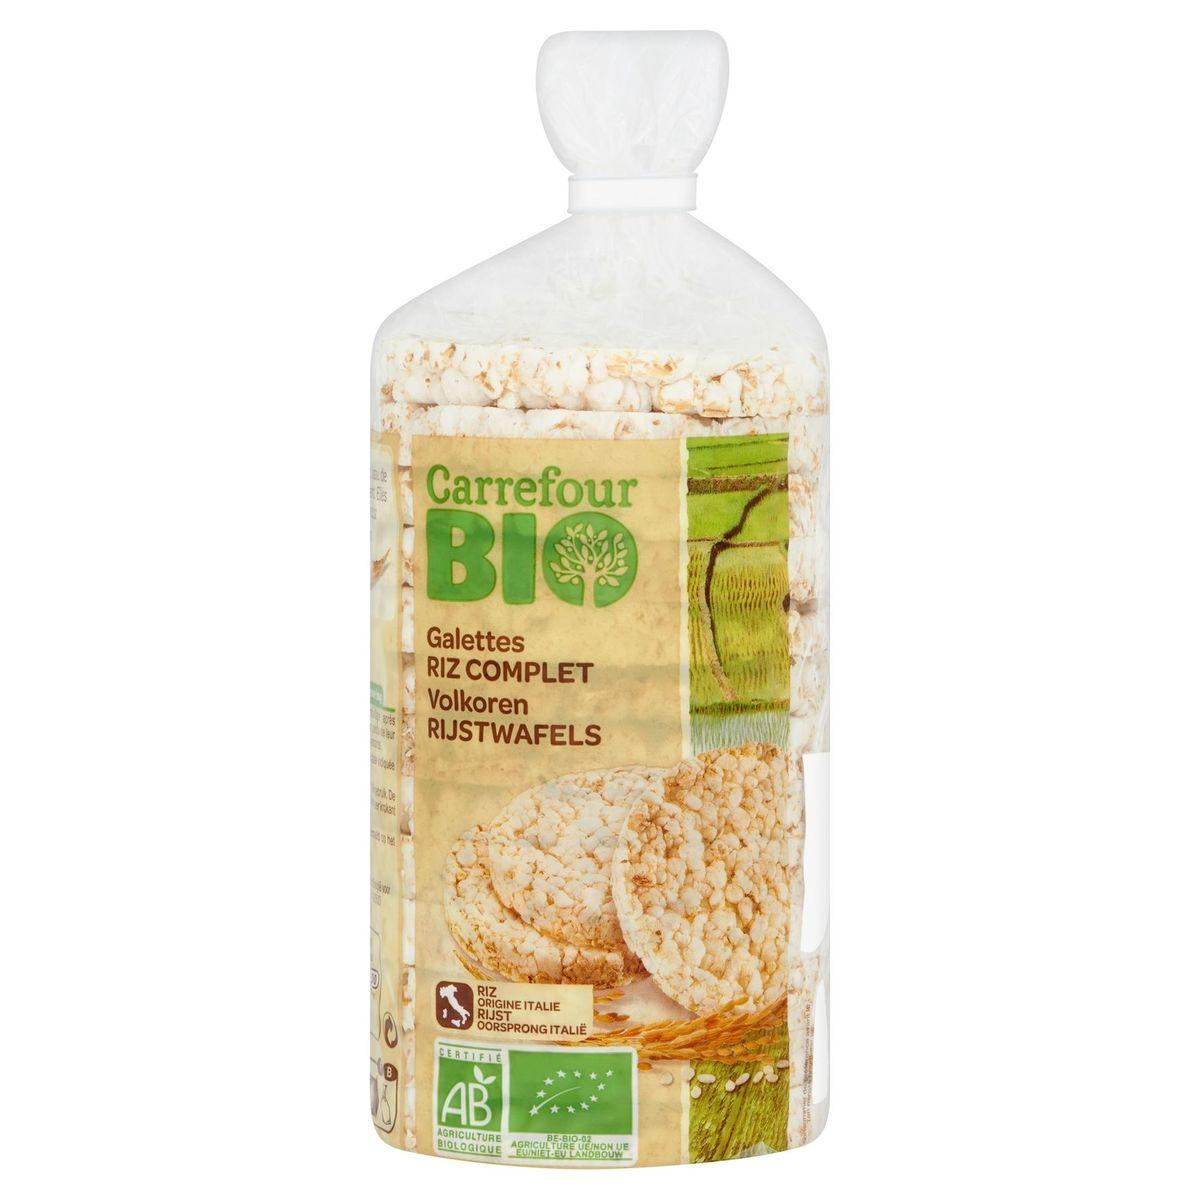 Carrefour Bio Galettes Riz Complet 100 g